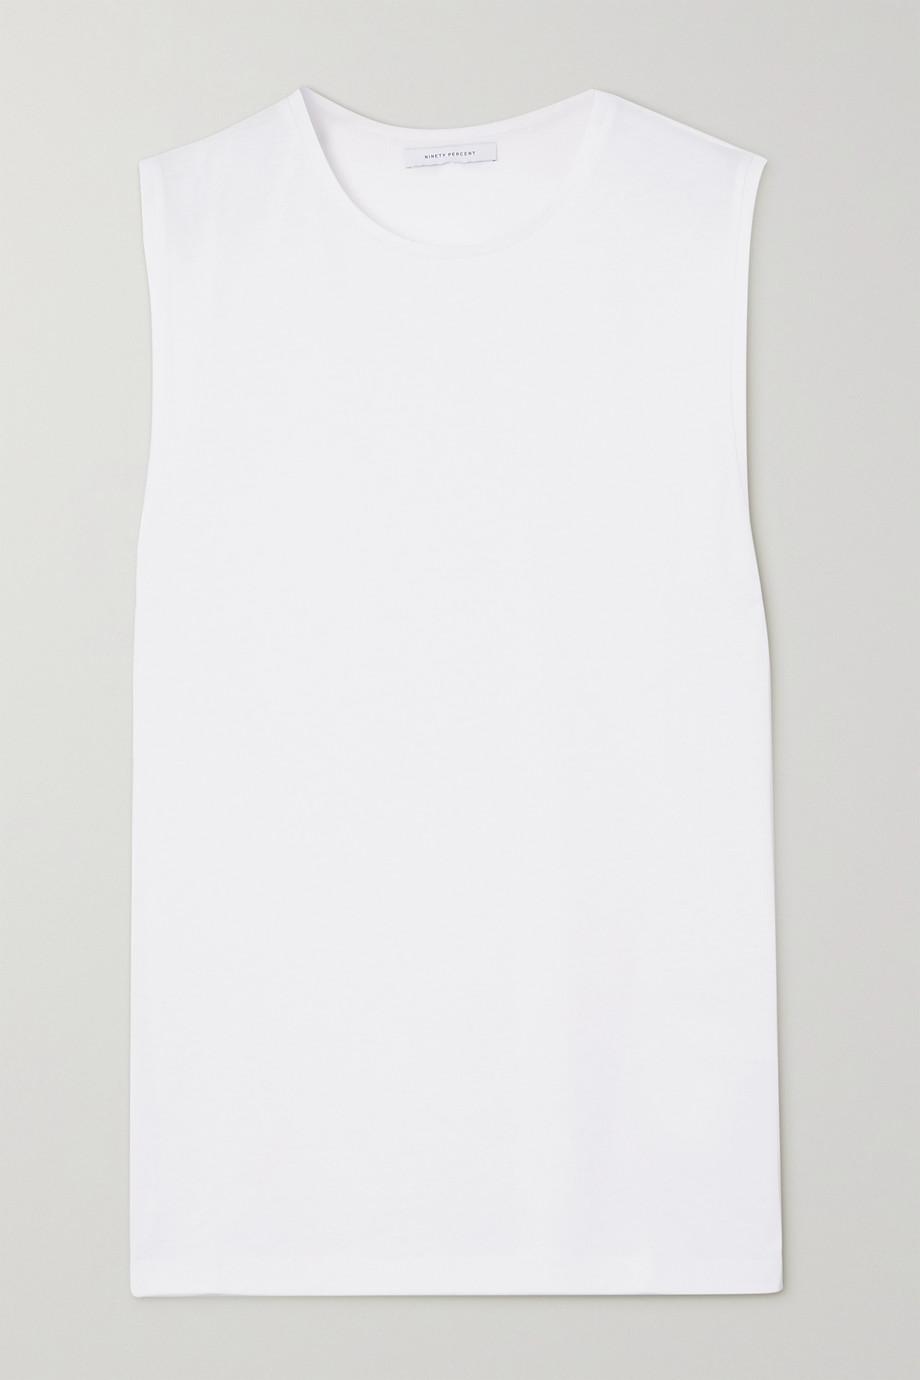 Ninety Percent + NET SUSTAIN organic cotton-jersey tank